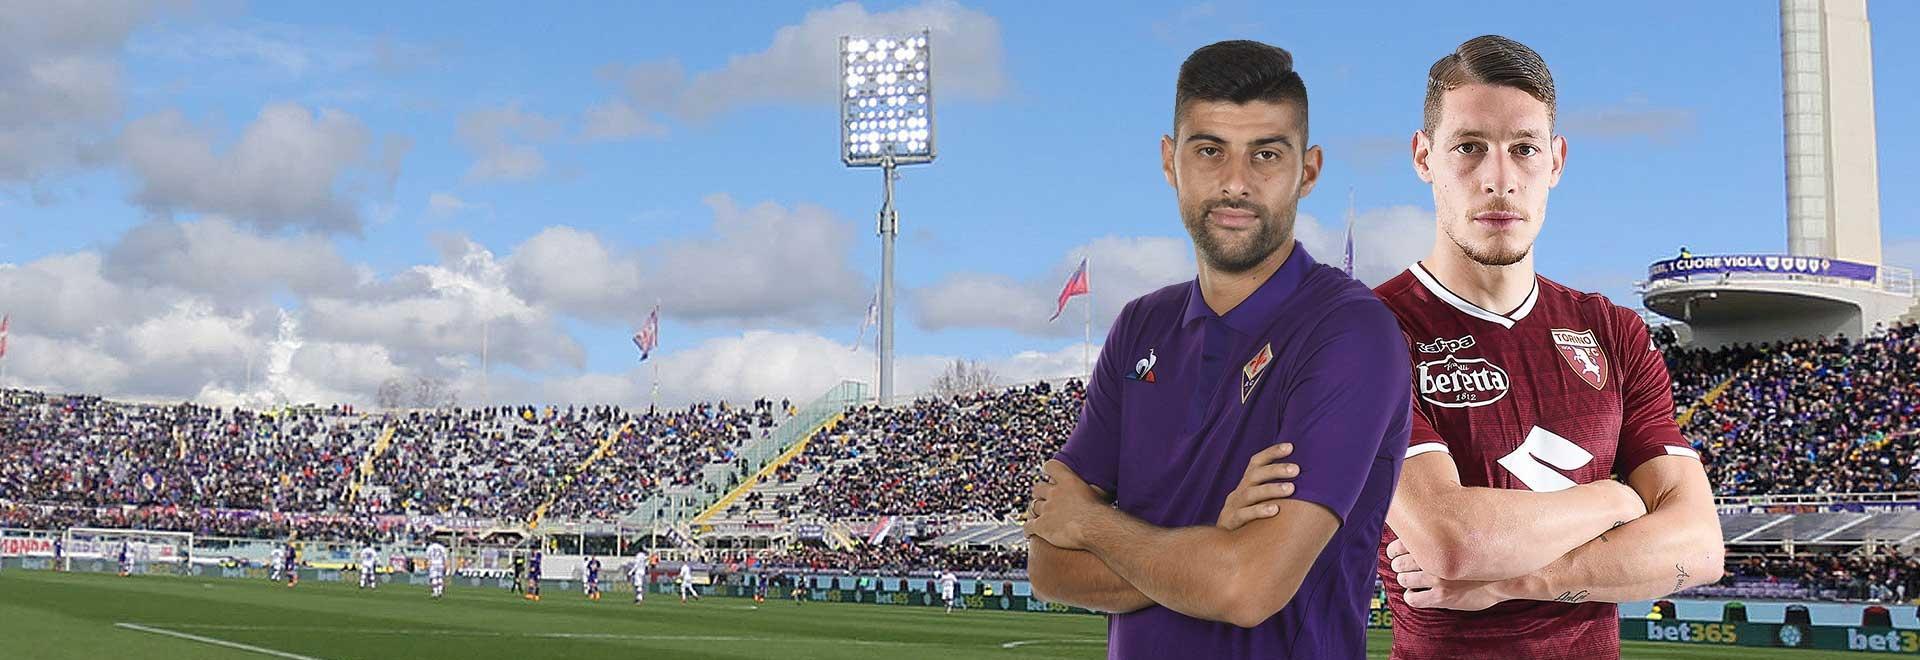 Fiorentina - Torino. 29a g.